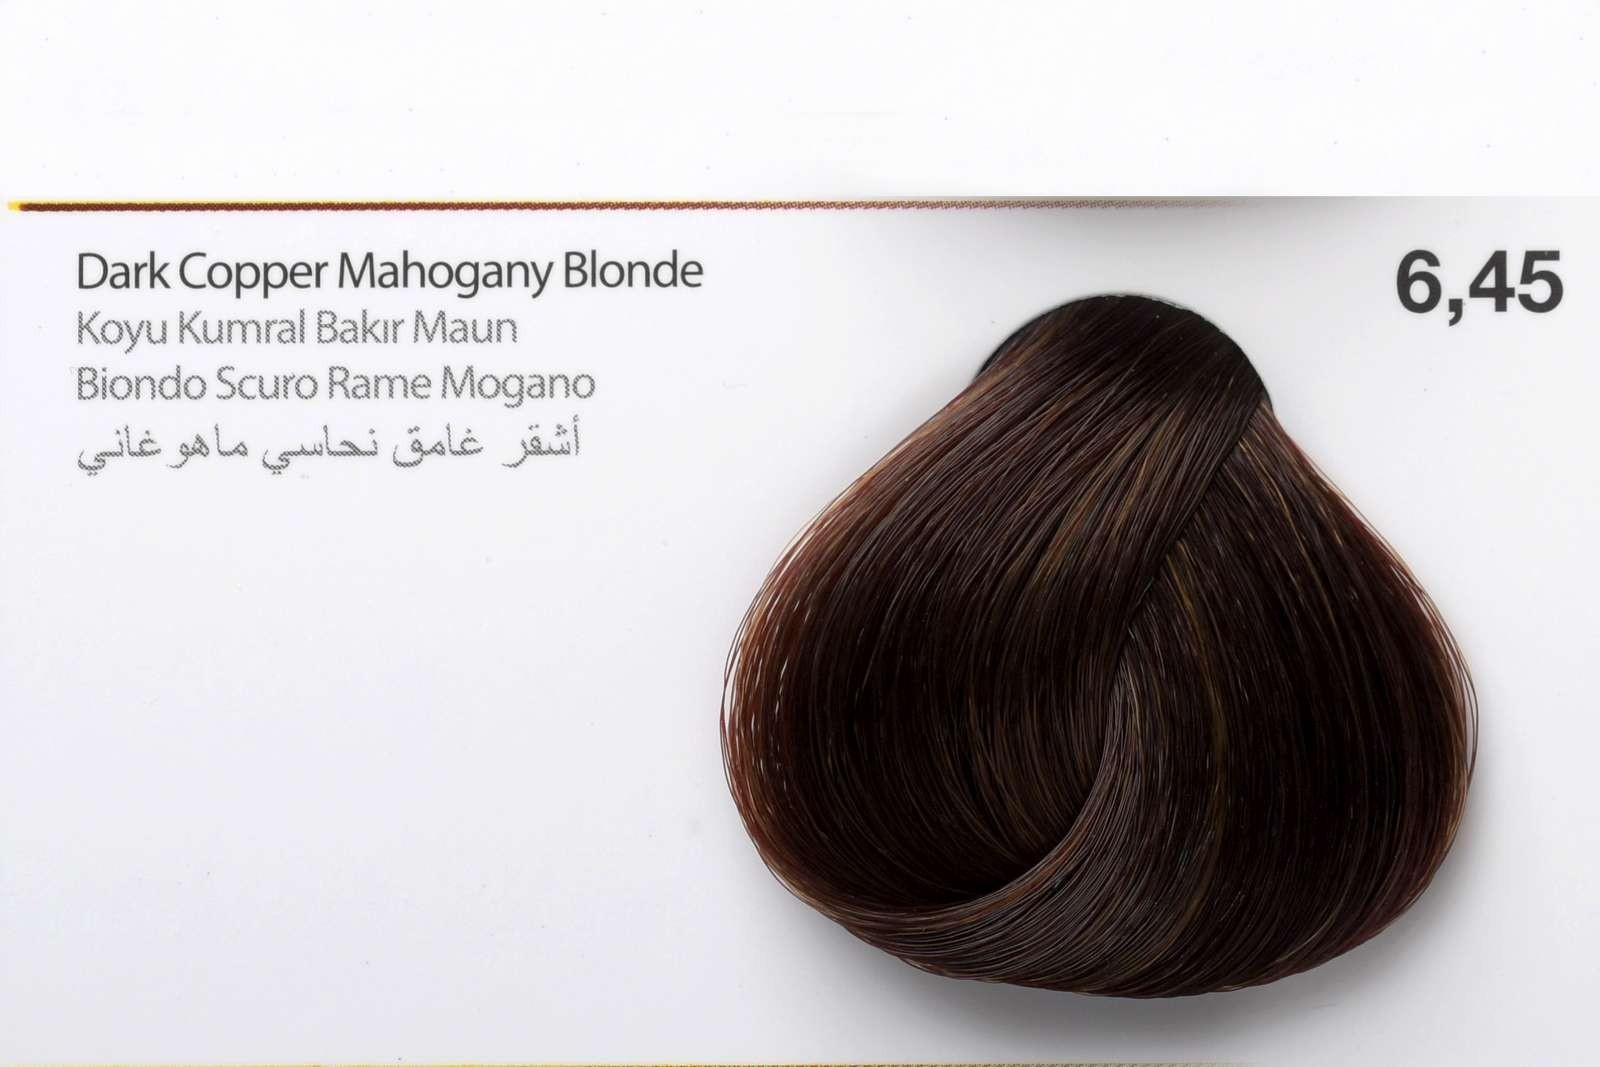 6,45 - Dark Copper Mahogany Blonde-swatch